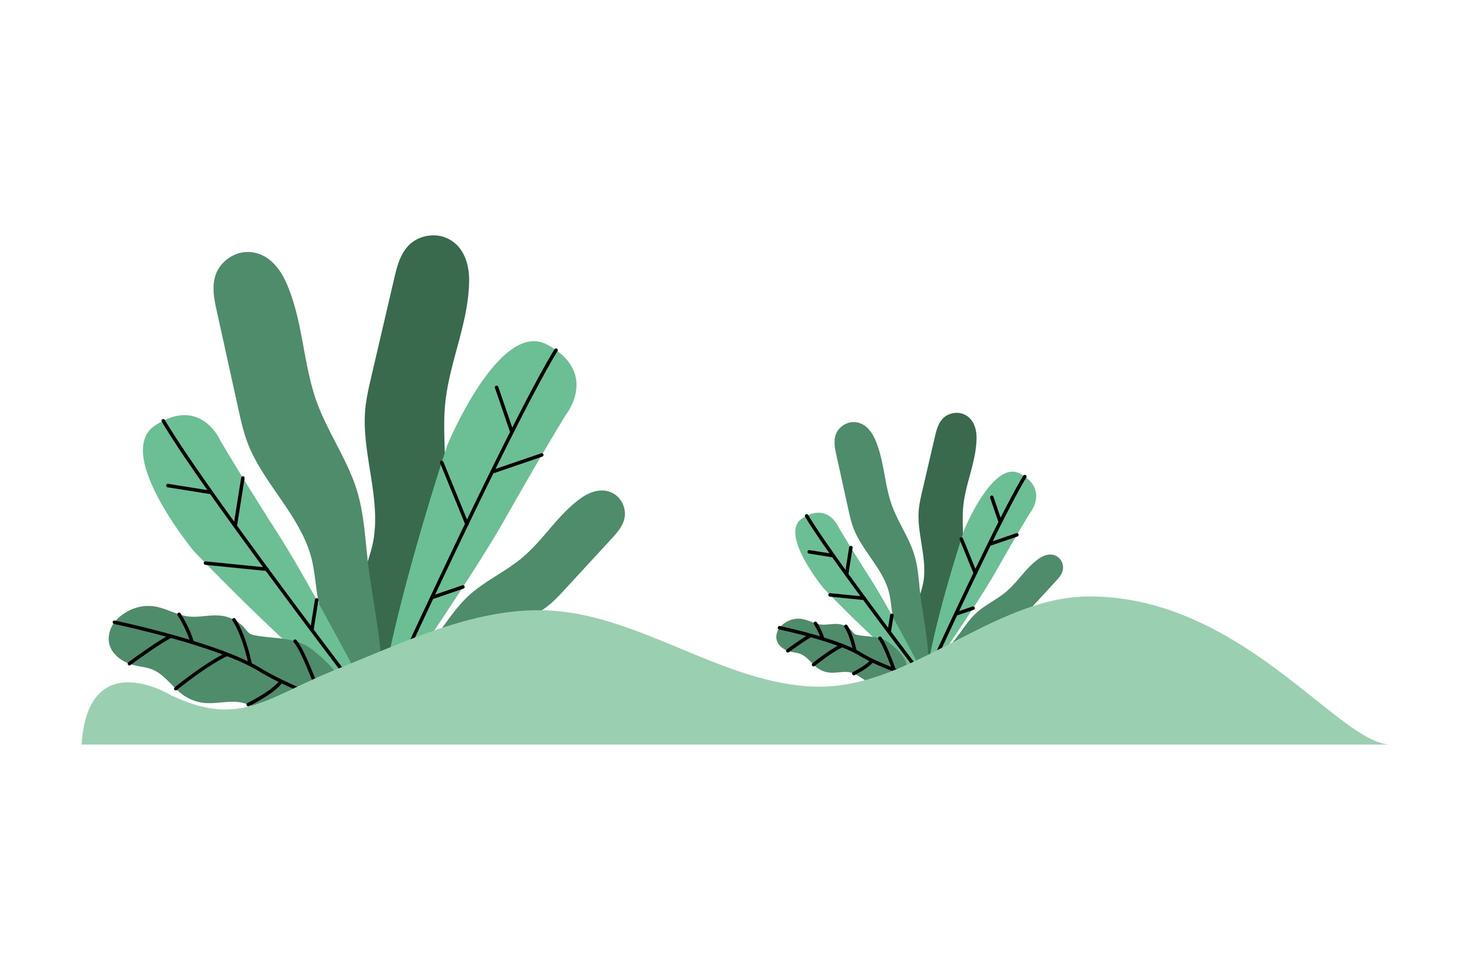 isolato foglie verdi icona disegno vettoriale